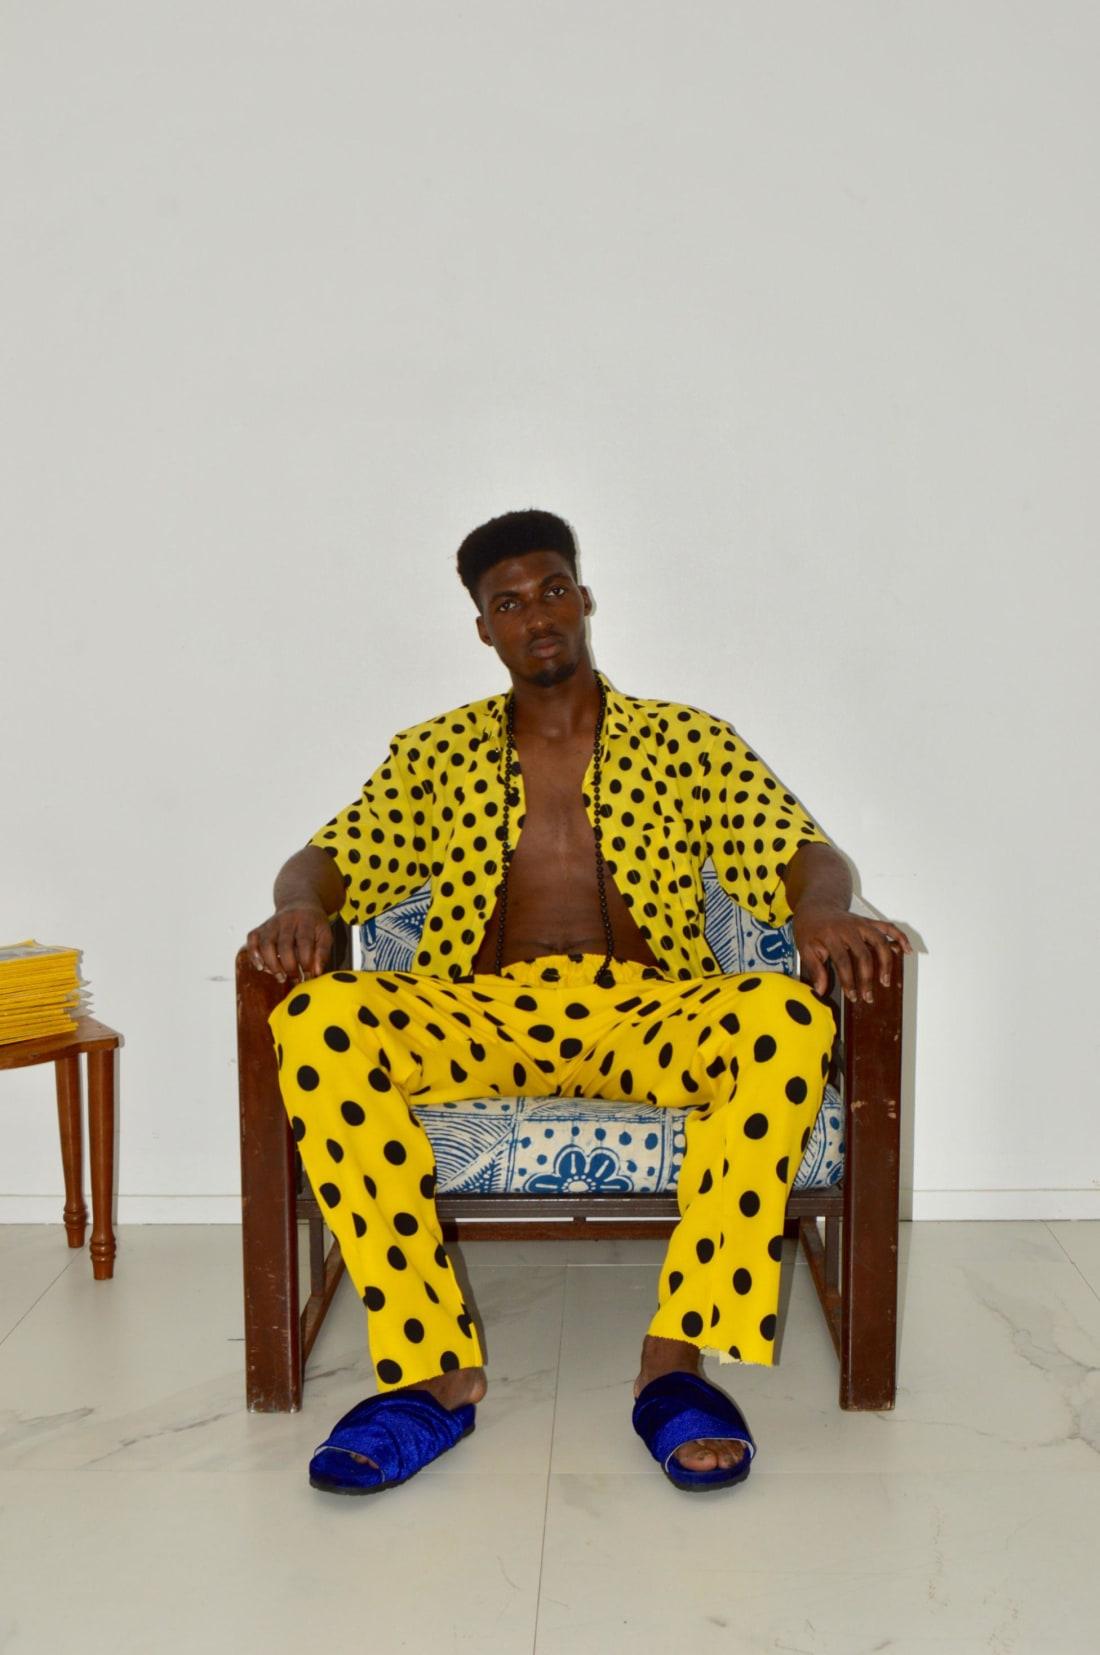 RESTRICTED 04 naomi campbell ian audifferen nigeria fashion hnk spc intl